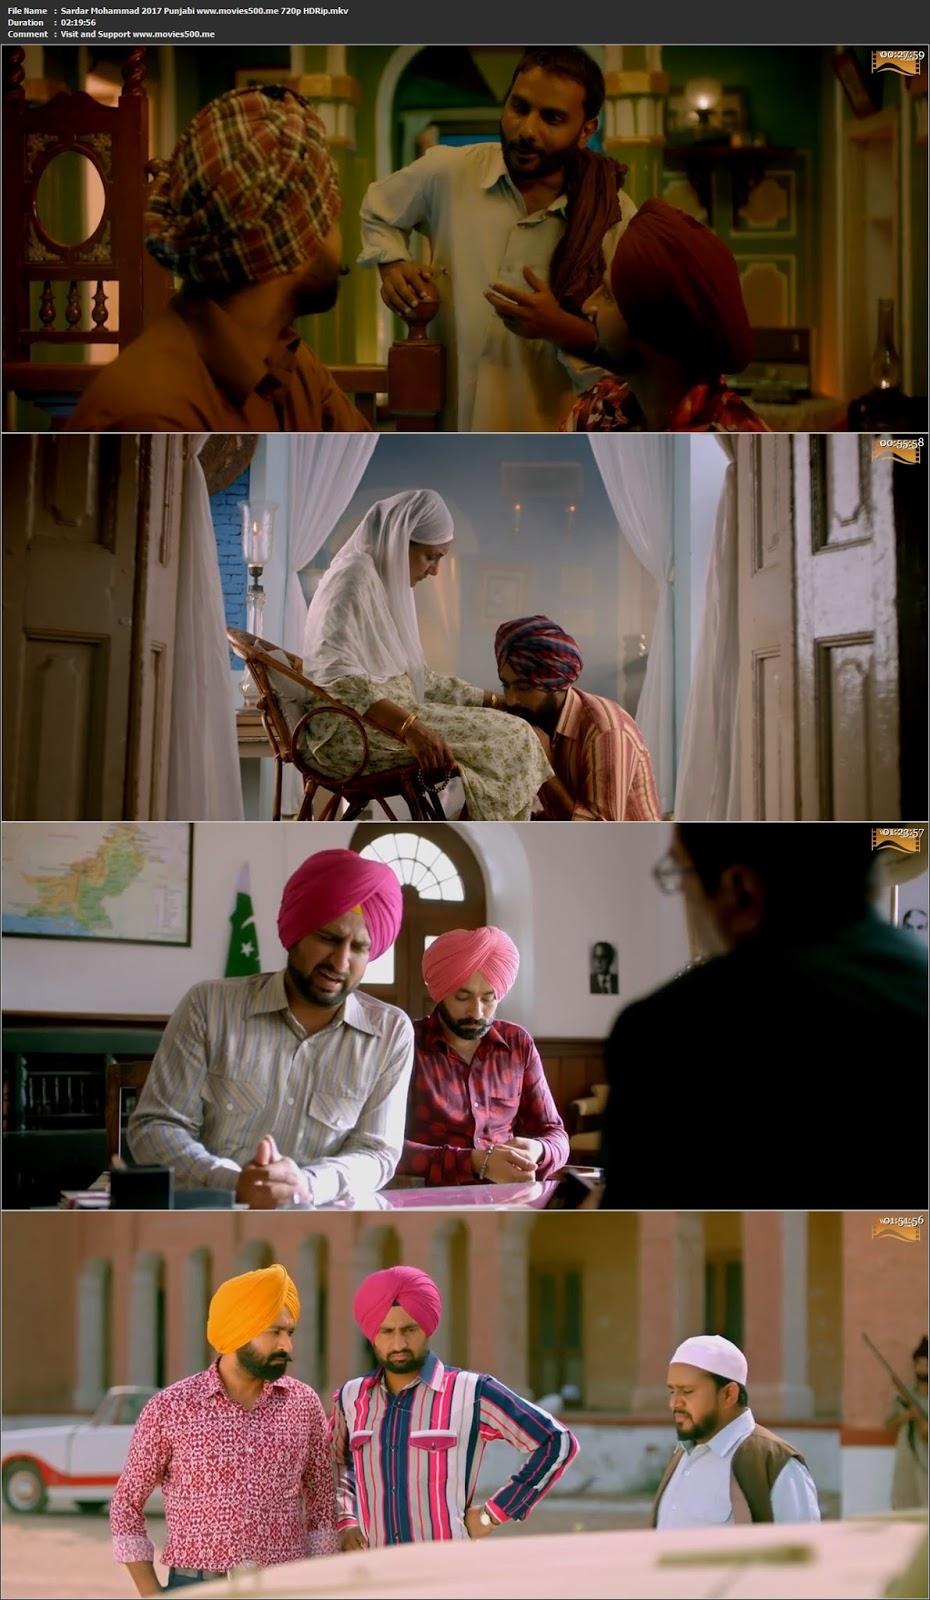 Sardar Mohammad 2017 Punjabi Full Movie HDRip 720p at doneintimeinc.com